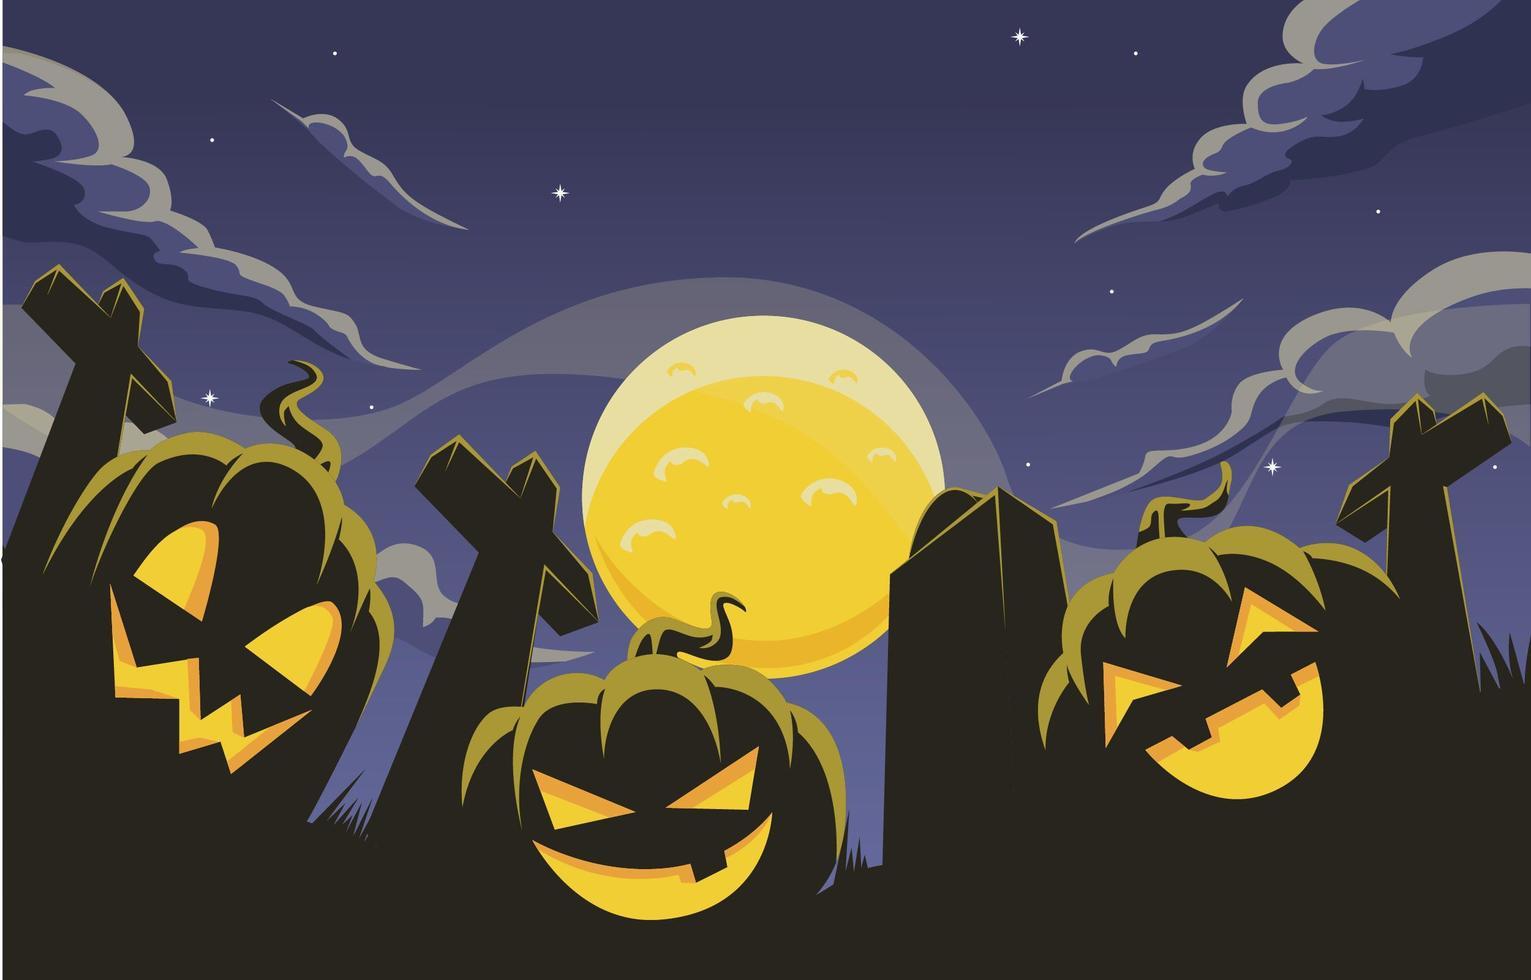 fond d'halloween avec silhouette jack-o'-lantern vecteur